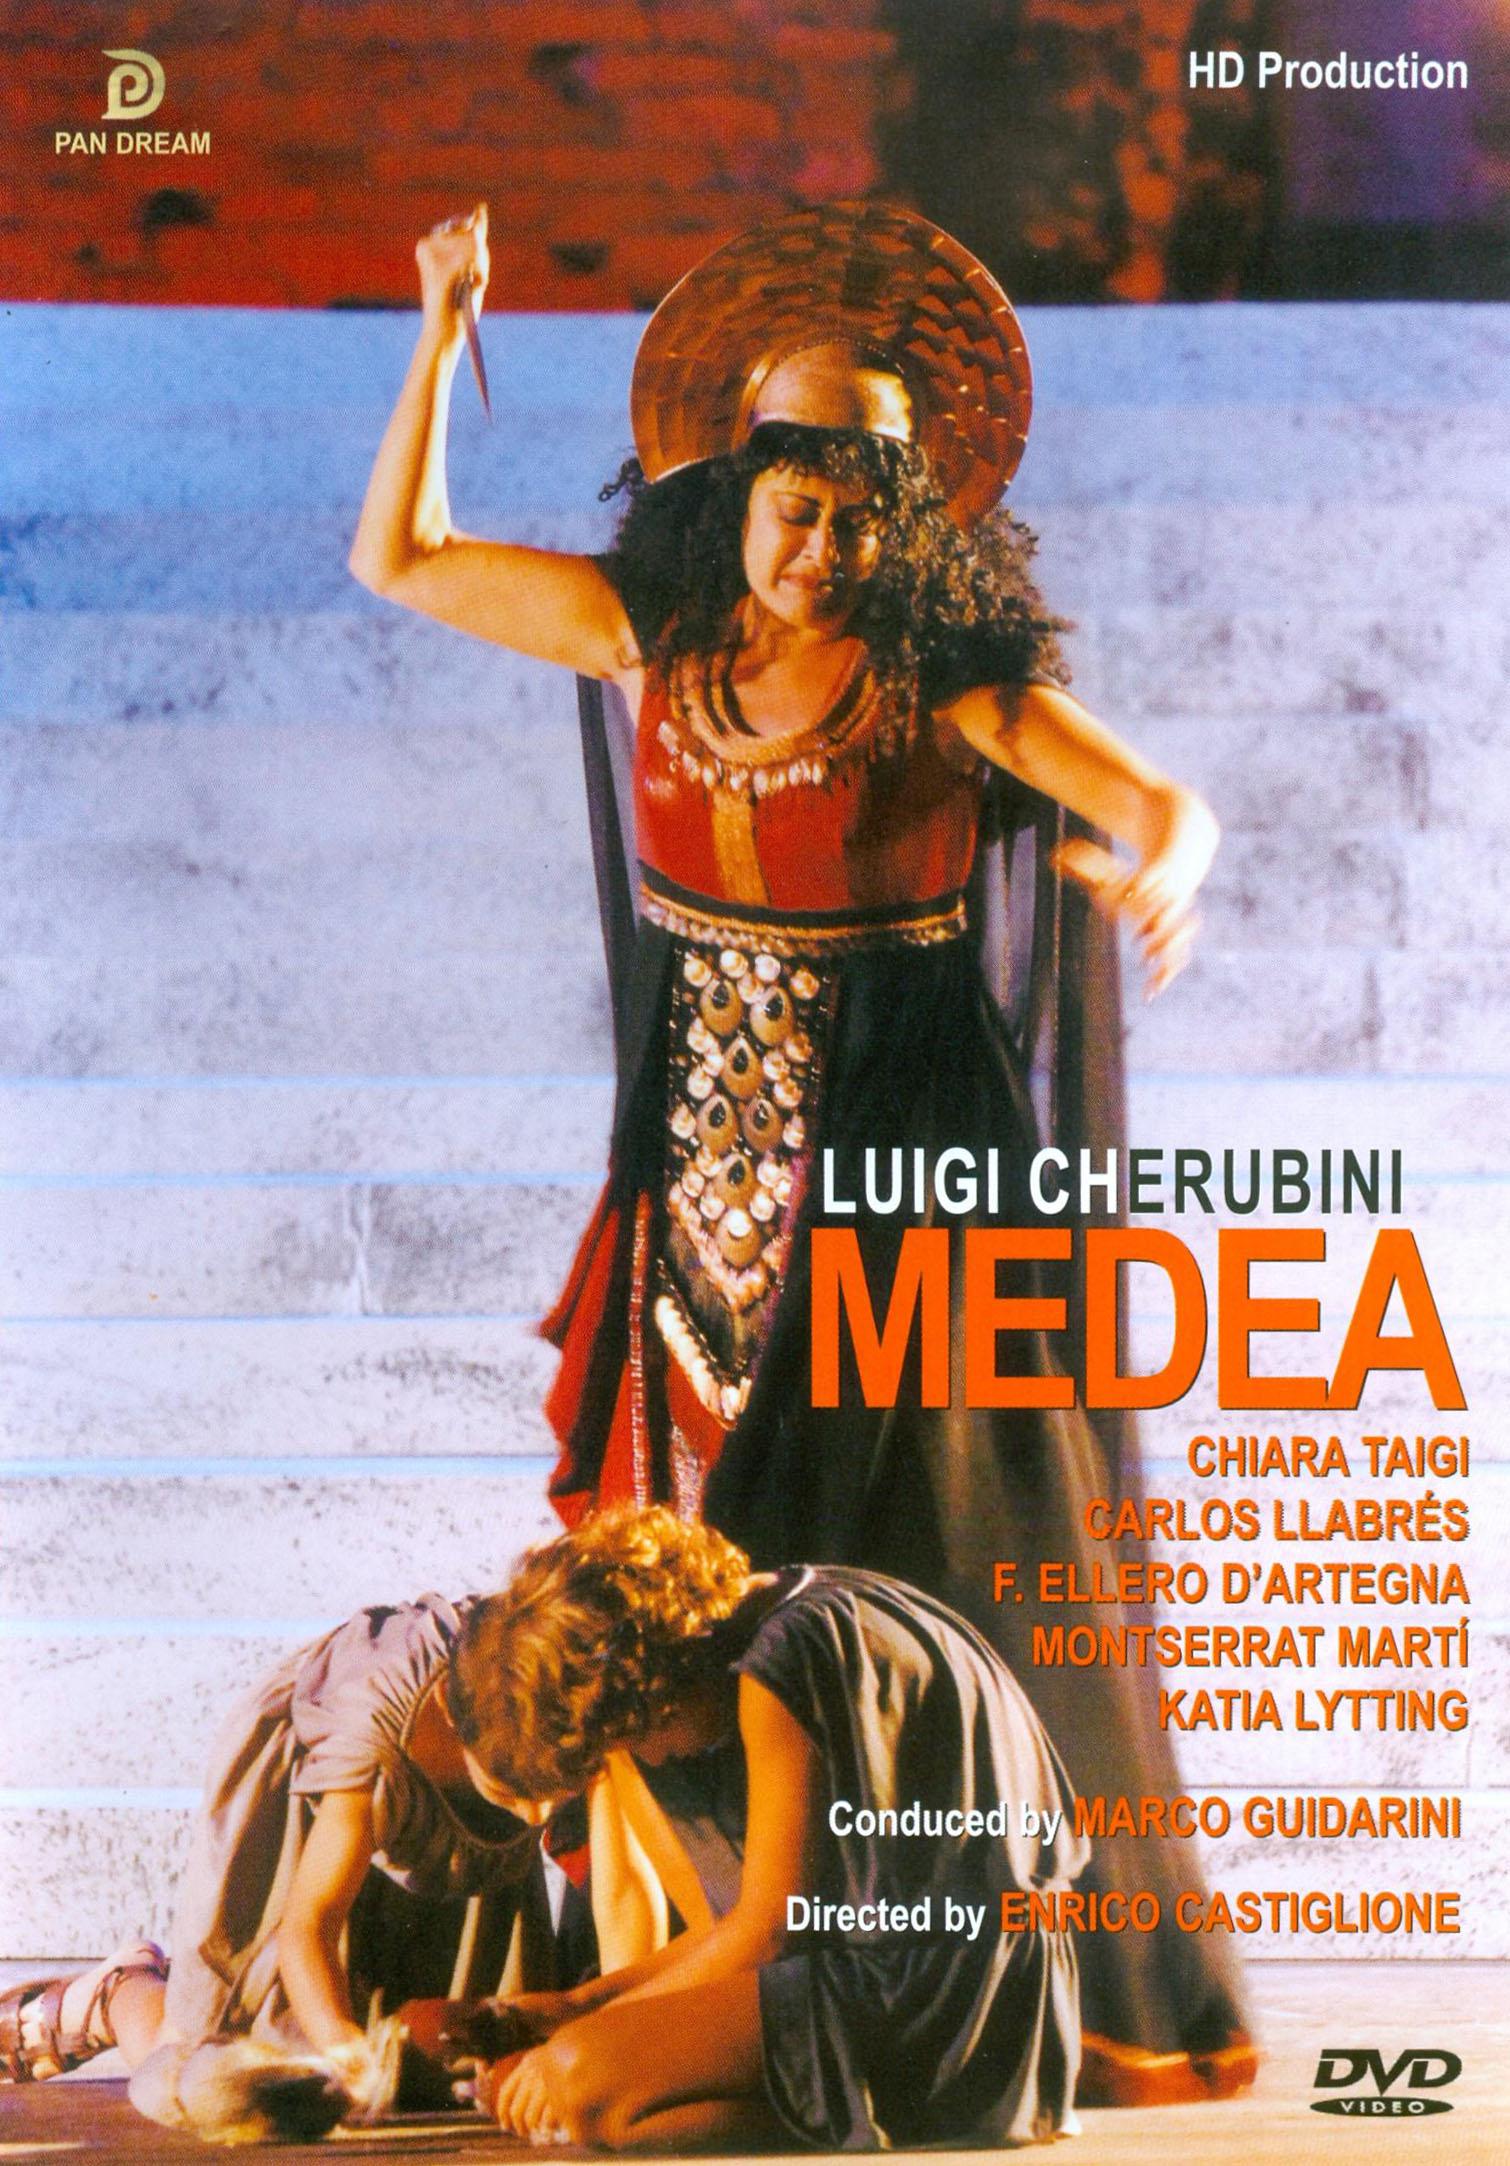 Medea (Greek Theatre of Taormina)